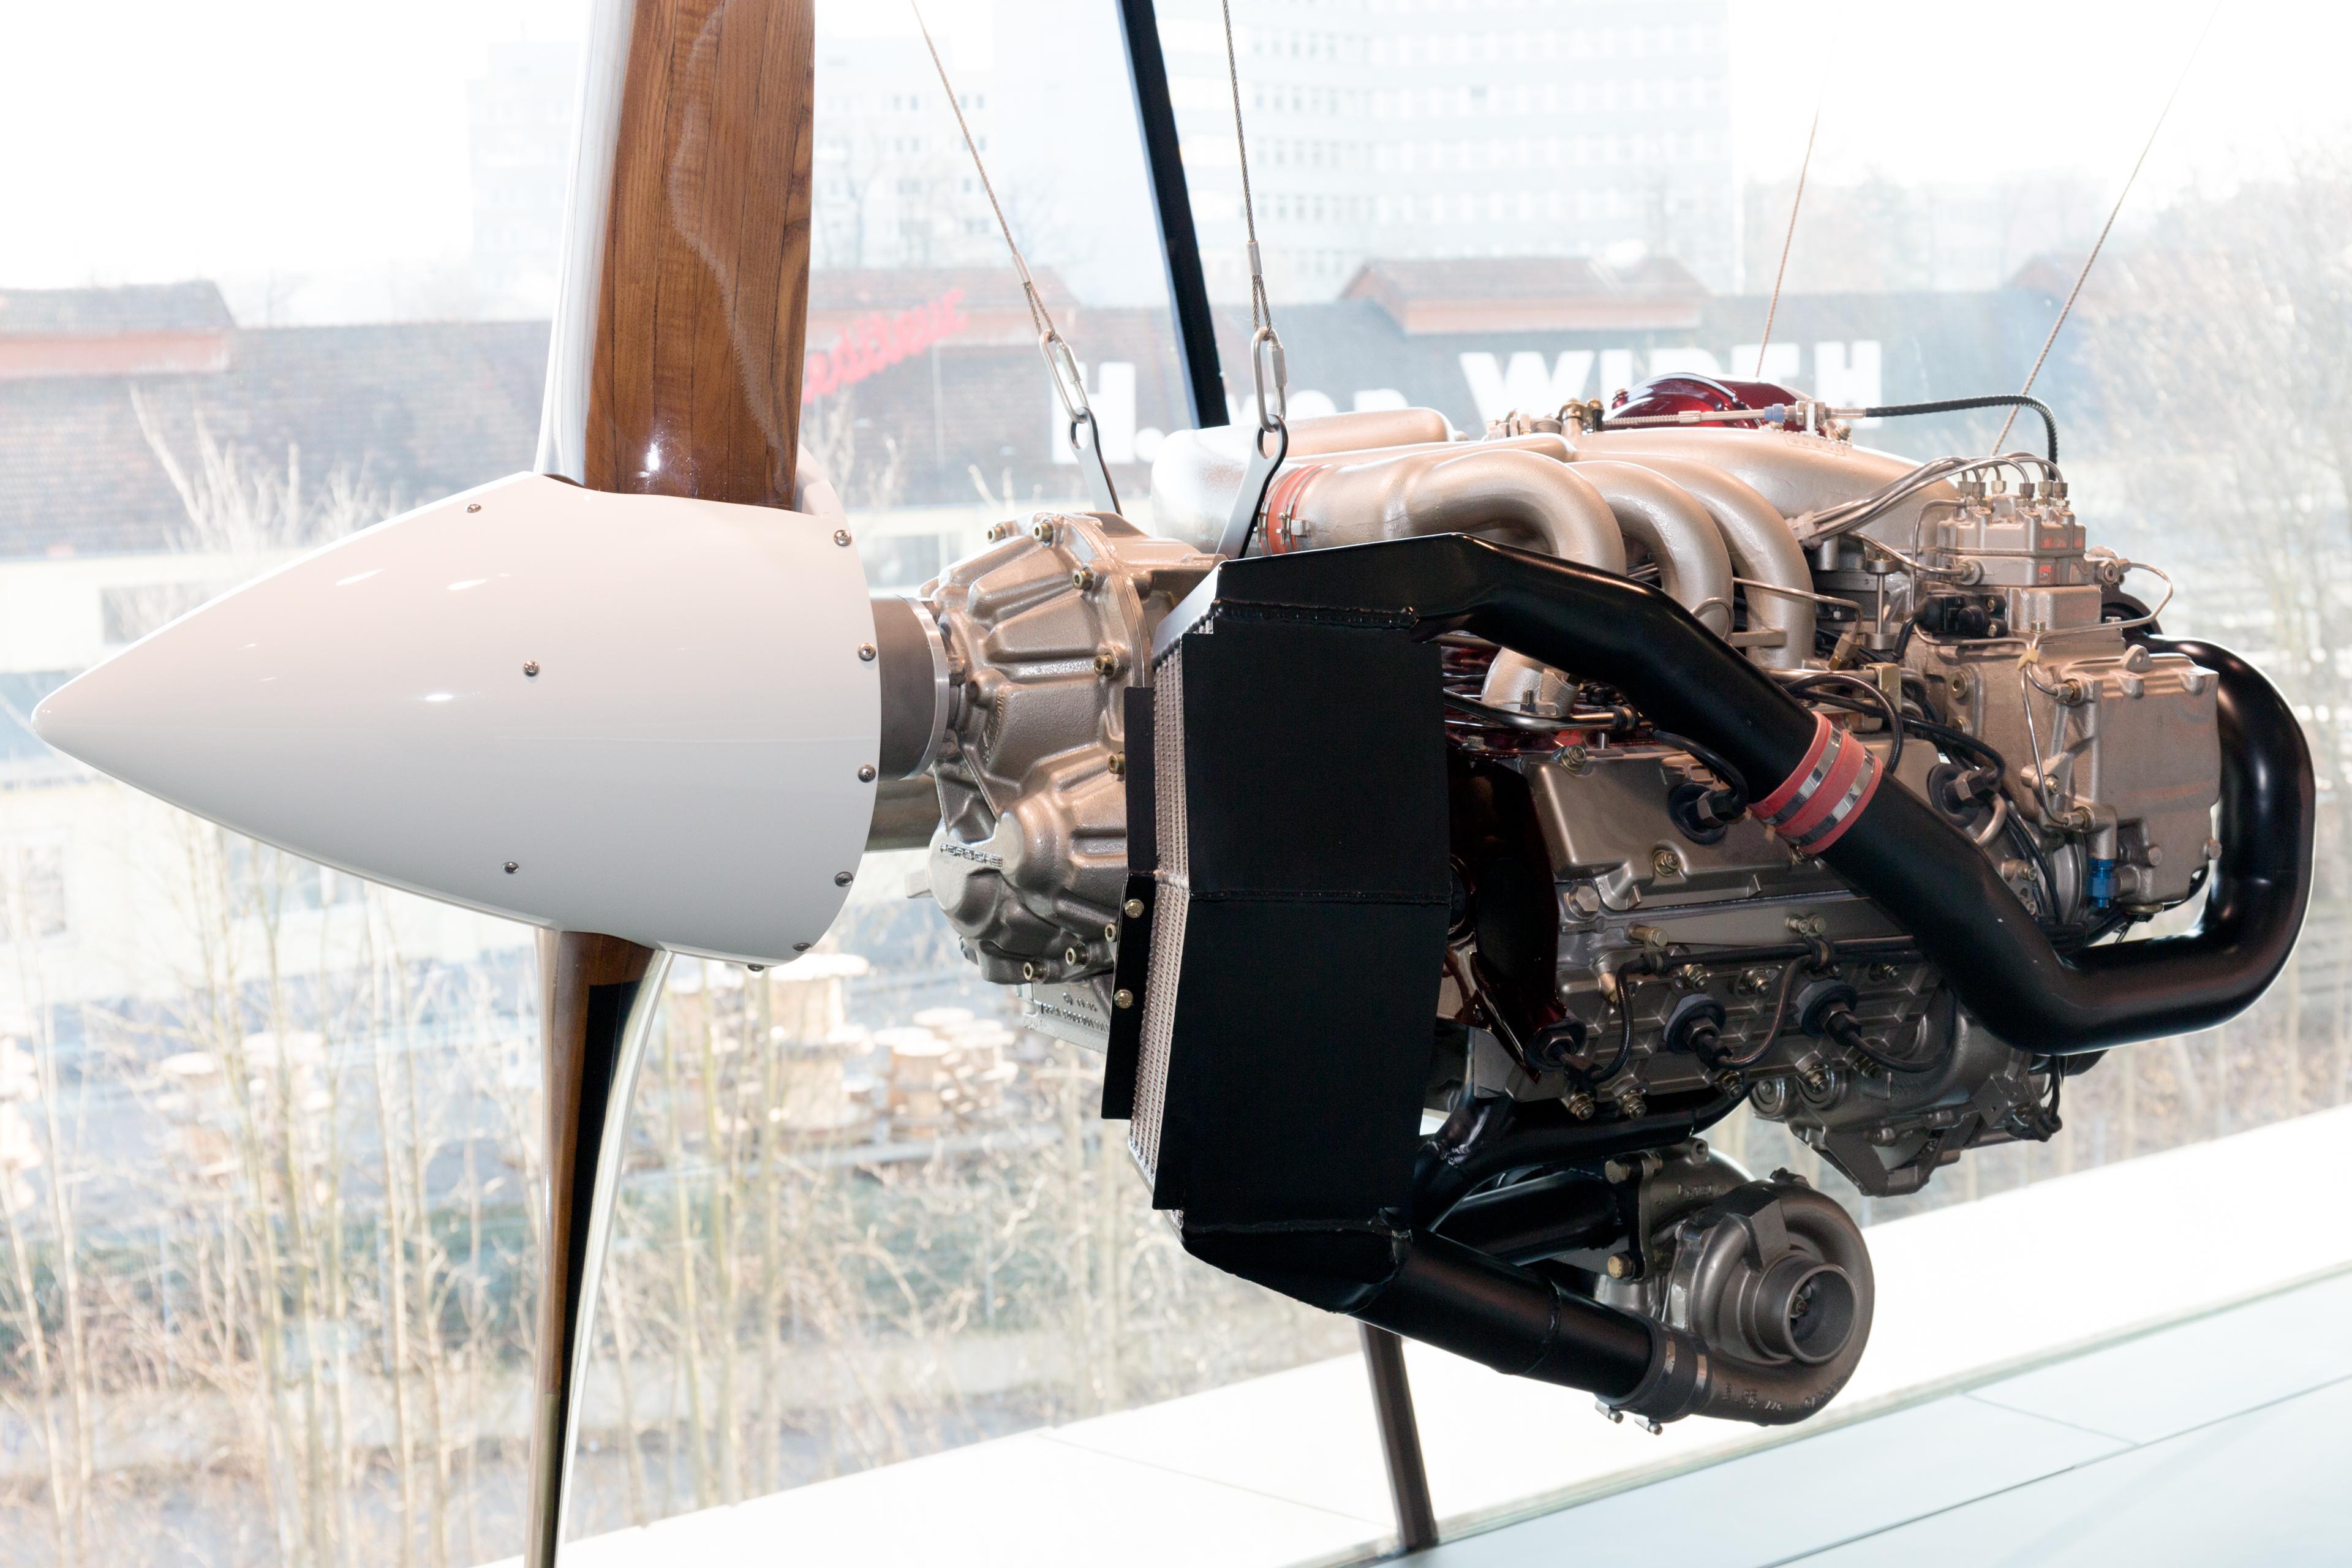 File:Porsche PFM 3200 engine front.